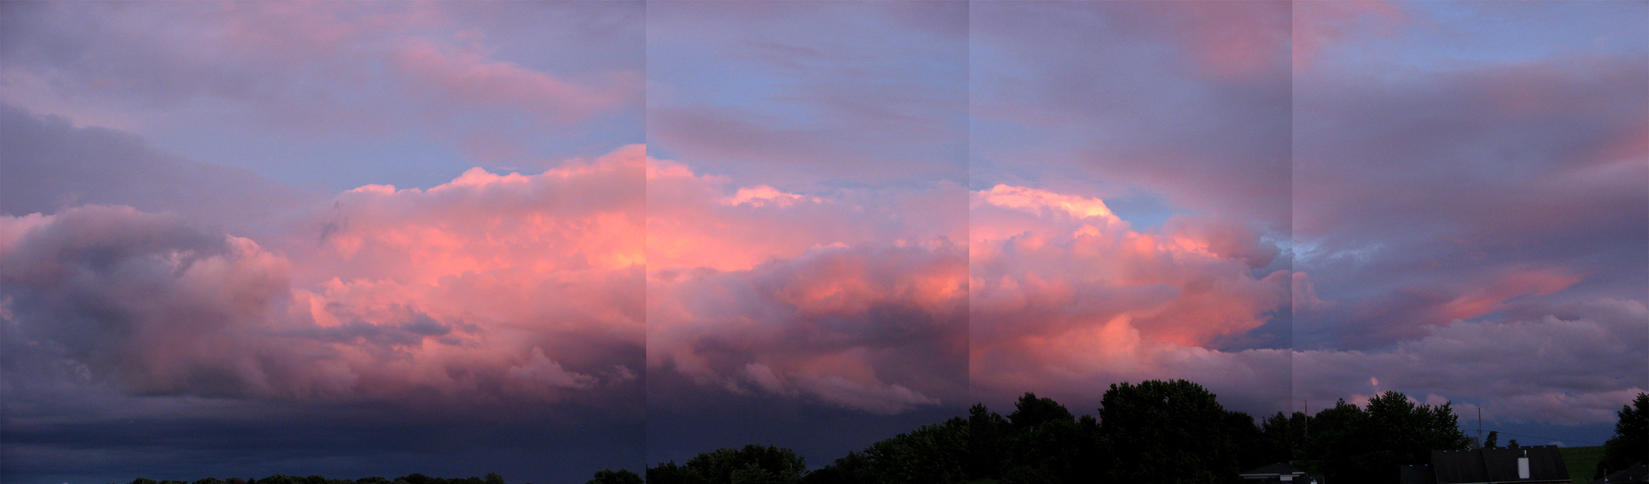 Jewelled Sky by shadowfire-x